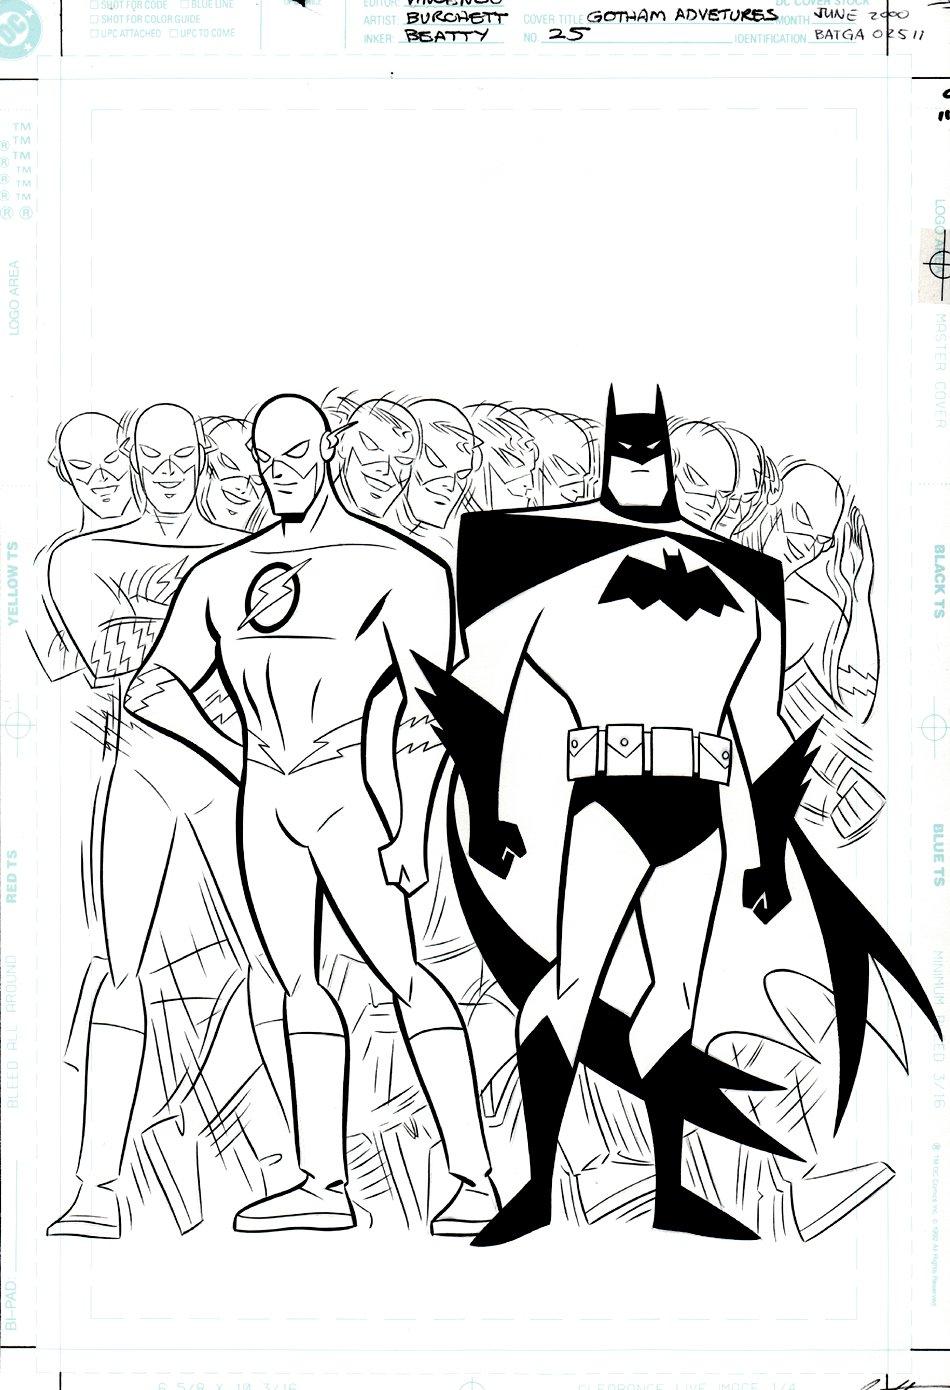 Batman: Gotham Adventures #25 Cover (2000)